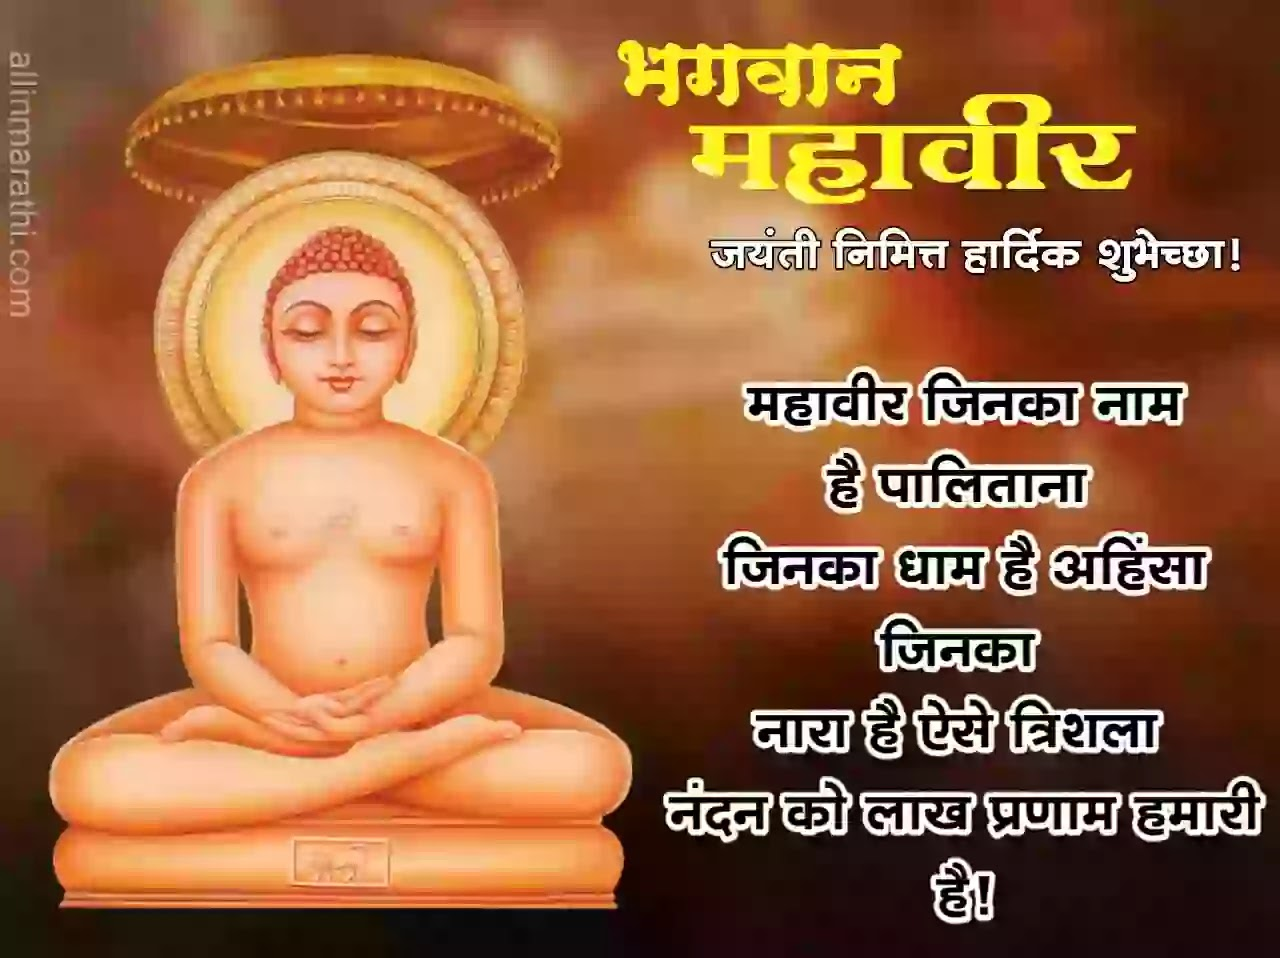 Bhagwan-mahavir-jayanti-images